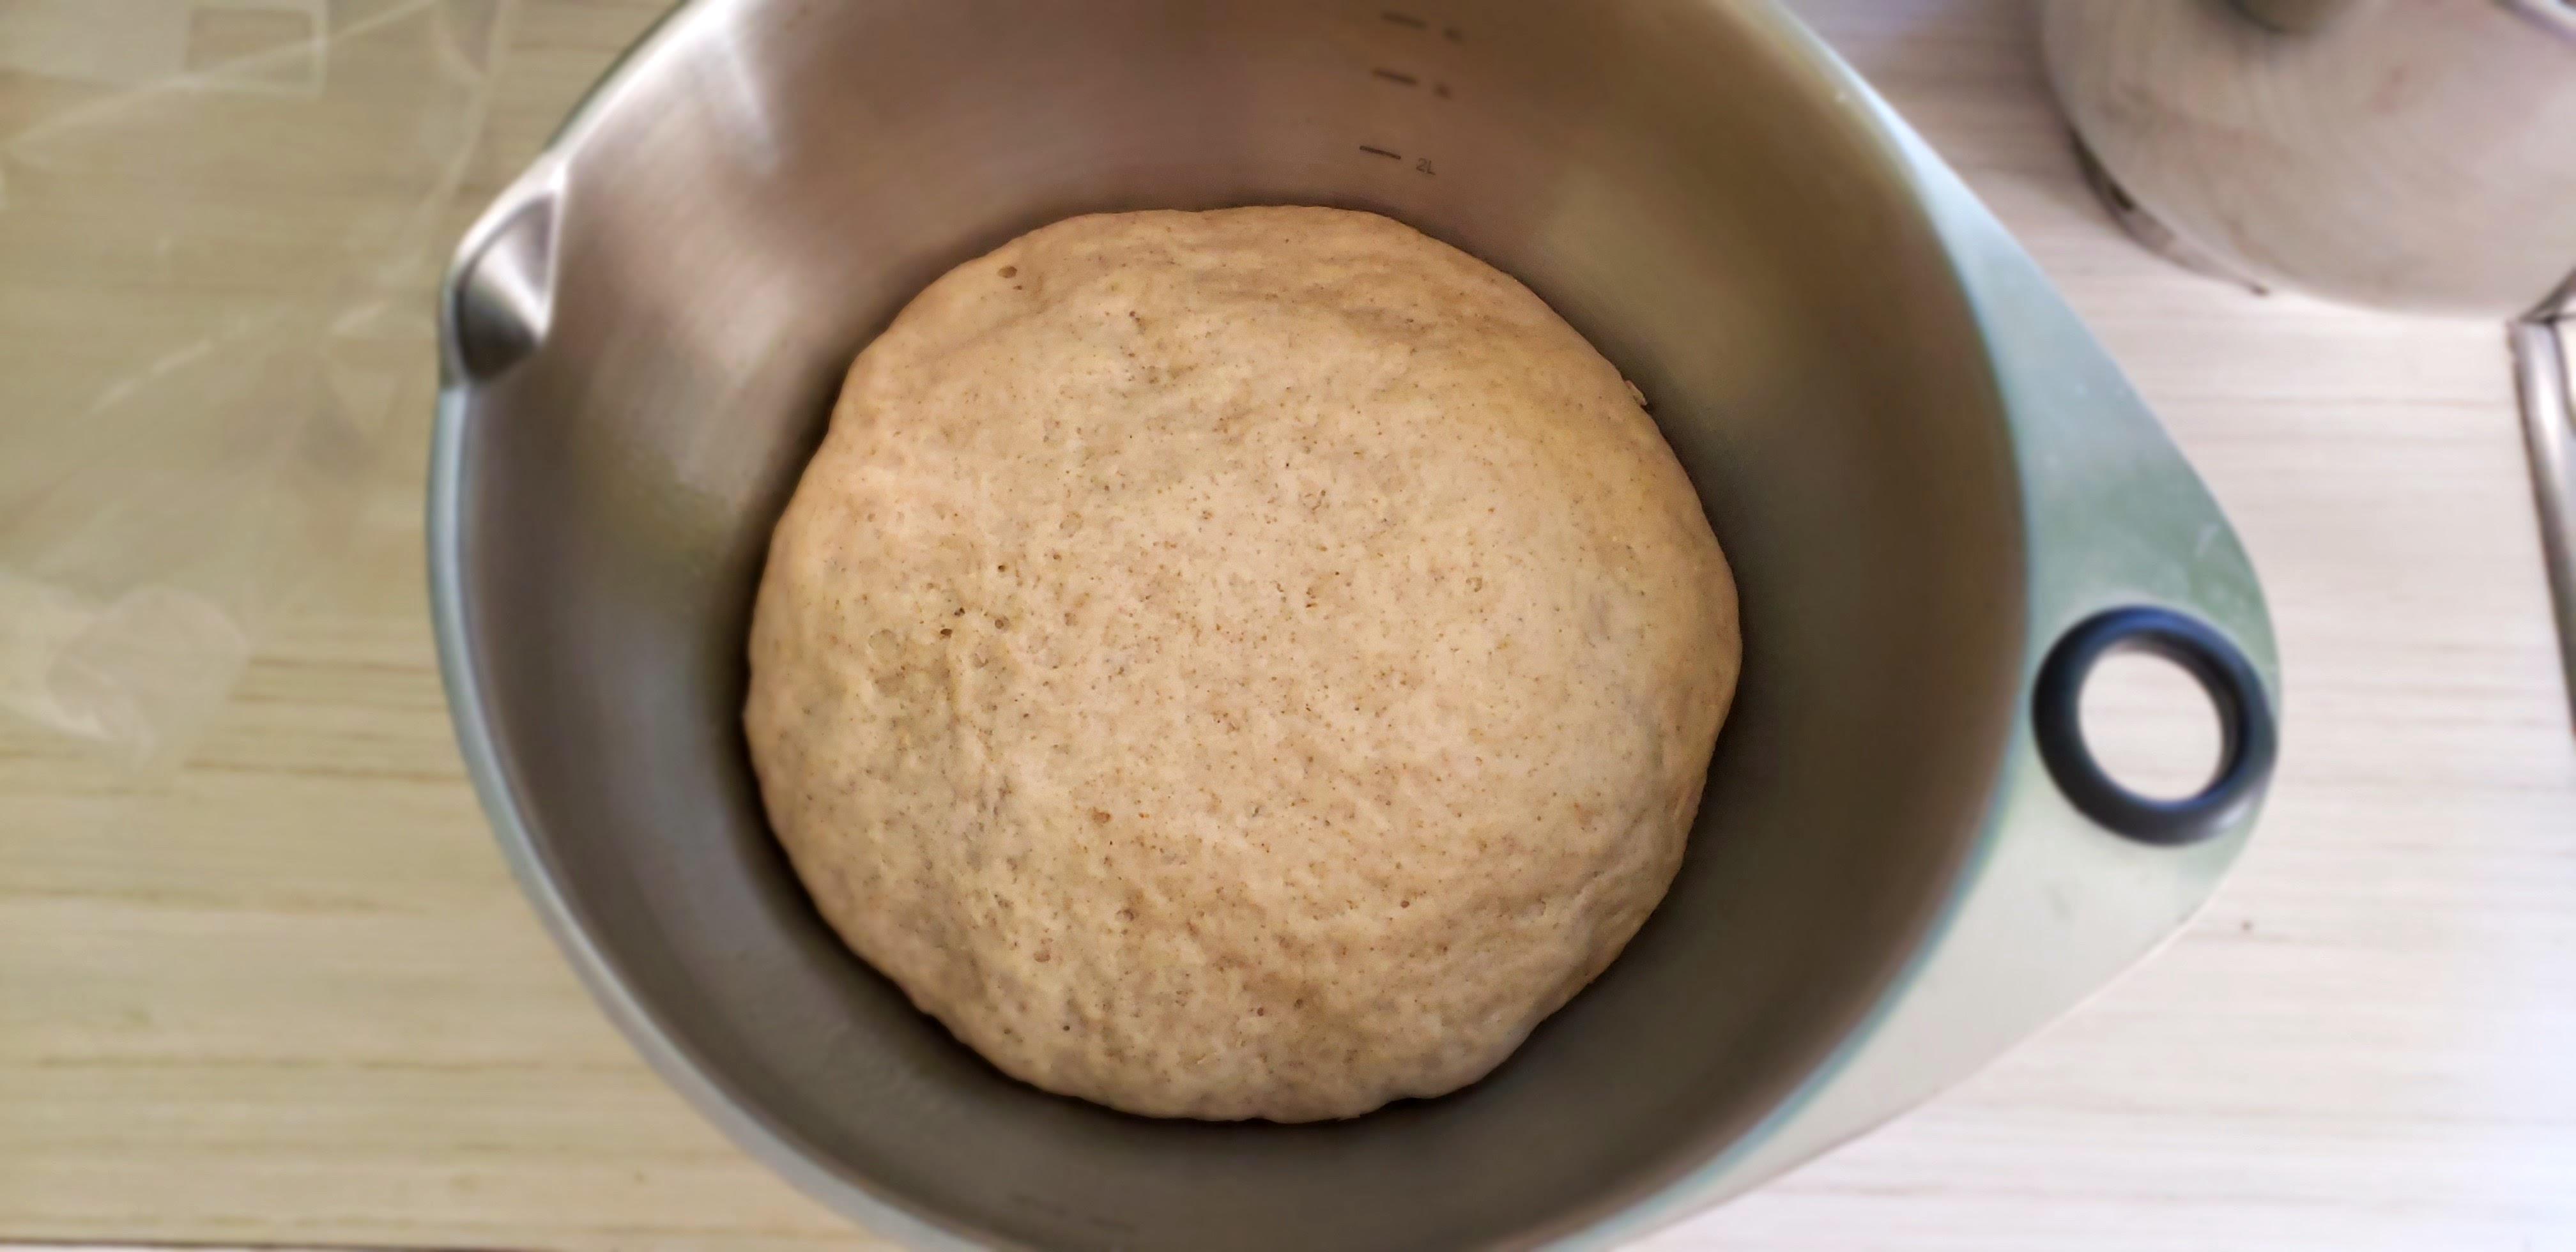 Rye dough doubled in bulk